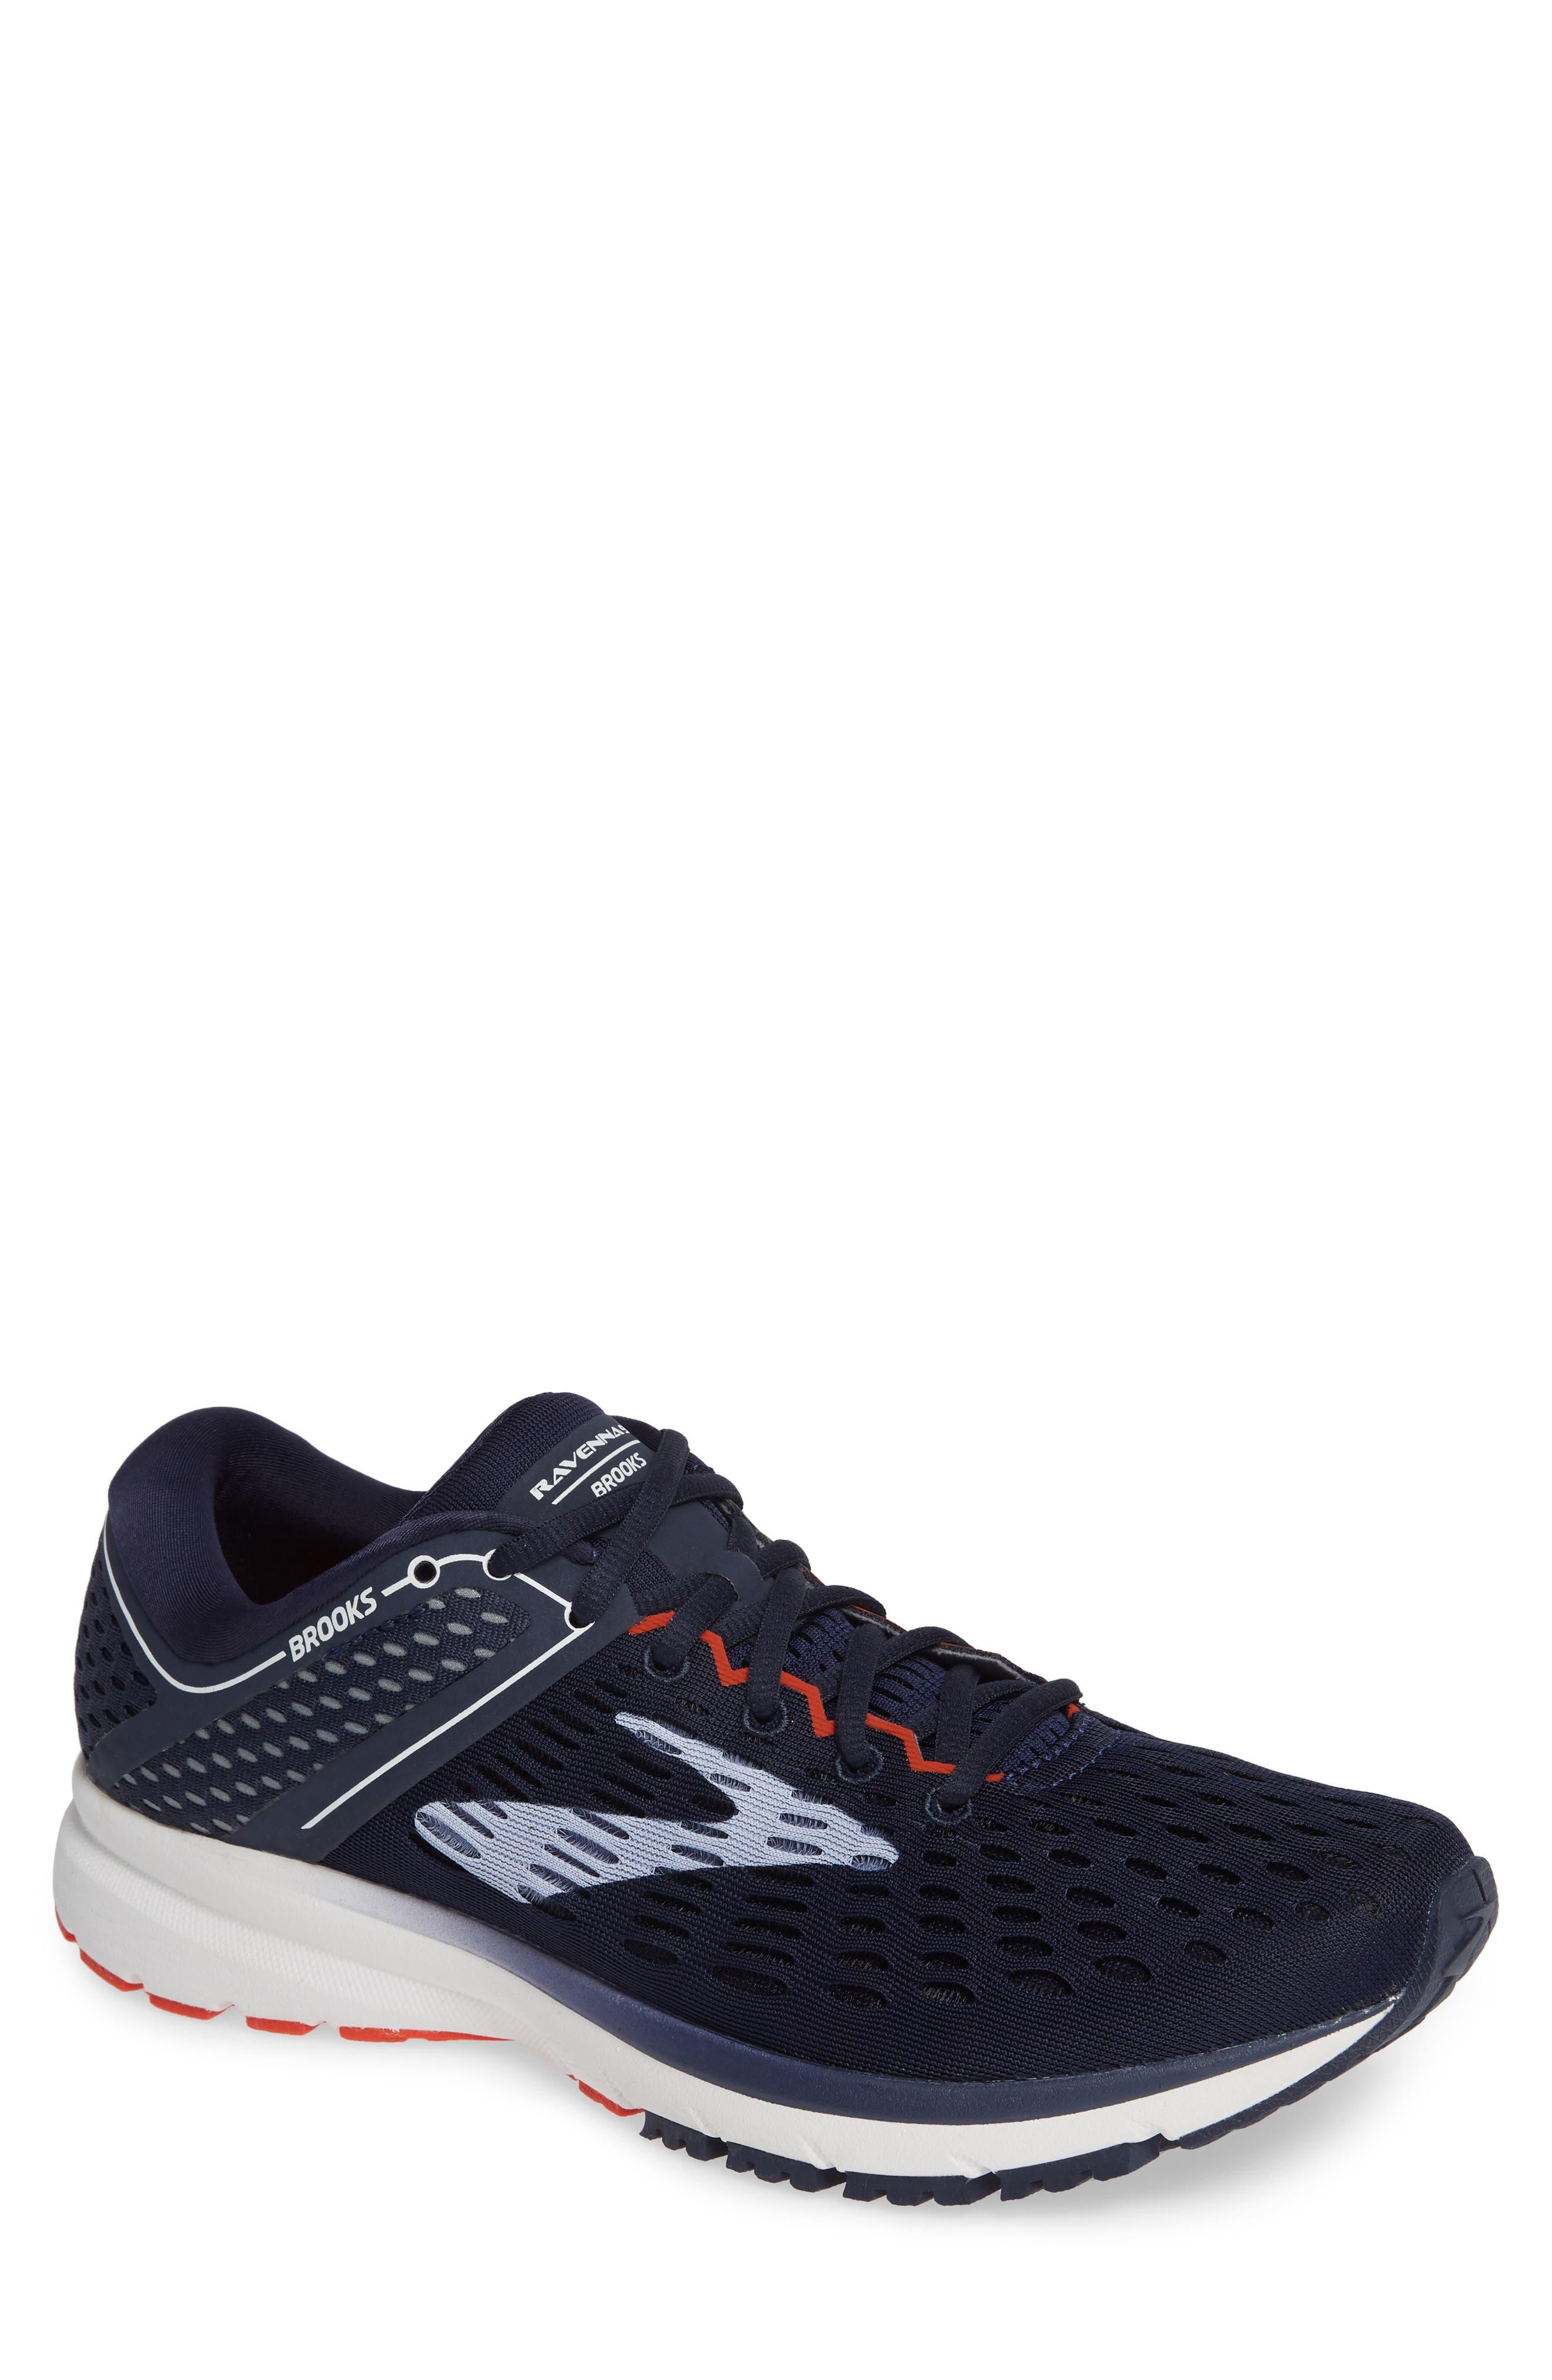 Ravenna 9 Running Shoe,                             Main thumbnail 1, color,                             Navy/ White/ Orange